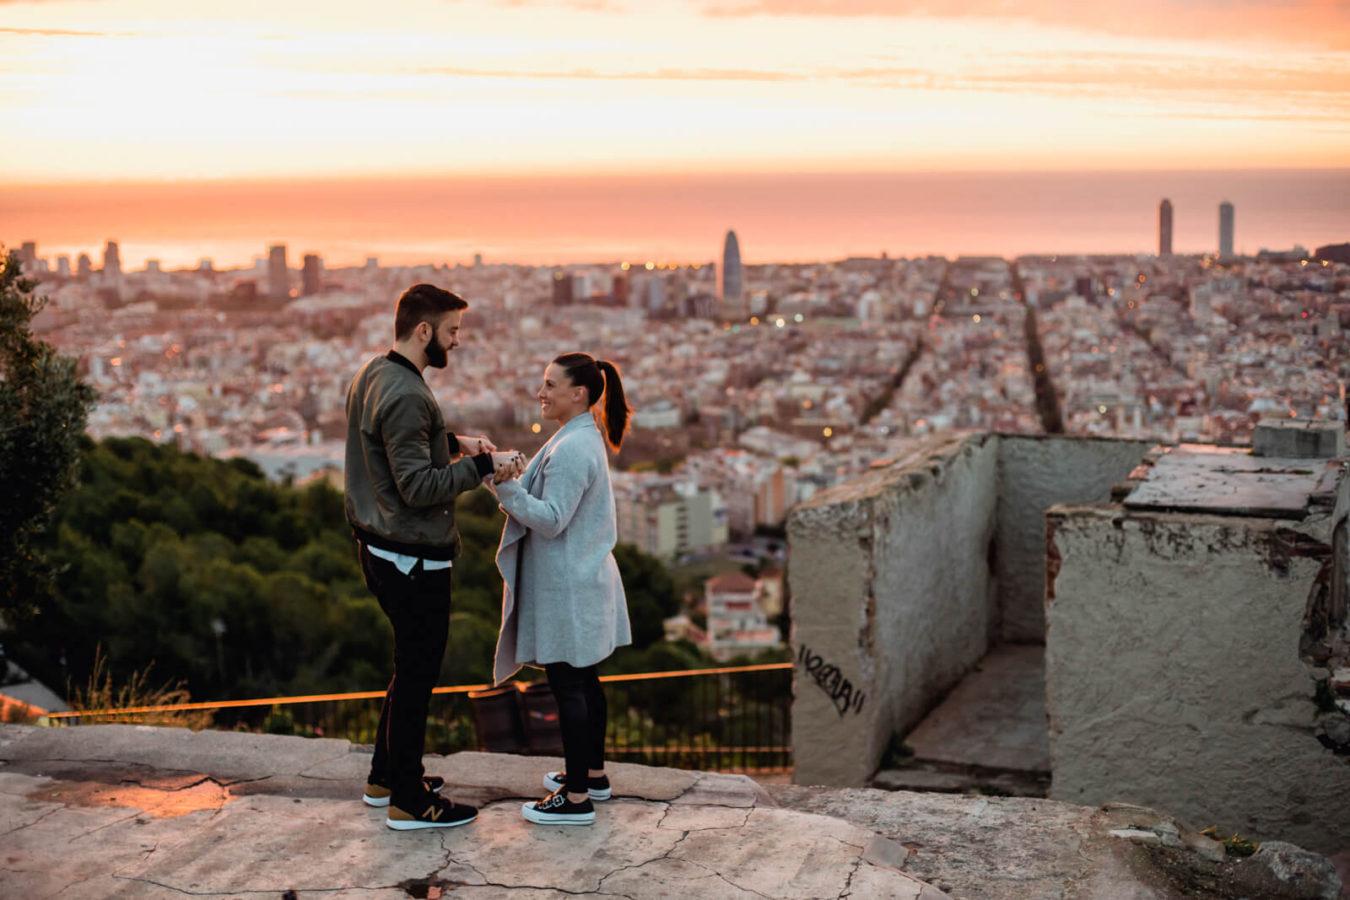 Fotografo Pedida de mano Barcelona Anna Svobodova